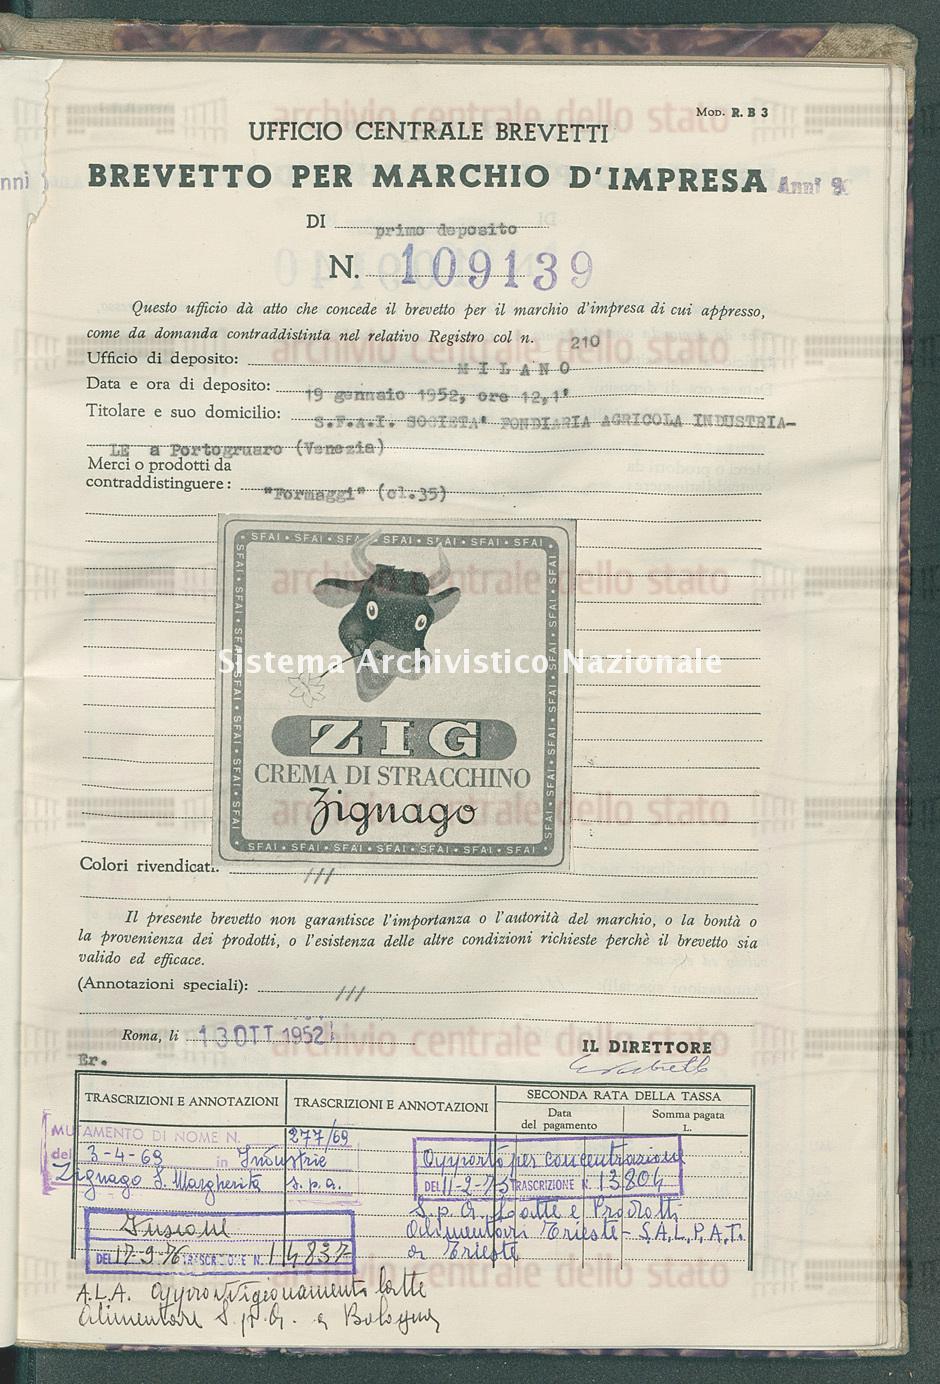 'Formaggi' S.F.A.I. Societa' Fondiaria Agricola Industriale (13/10/1952)